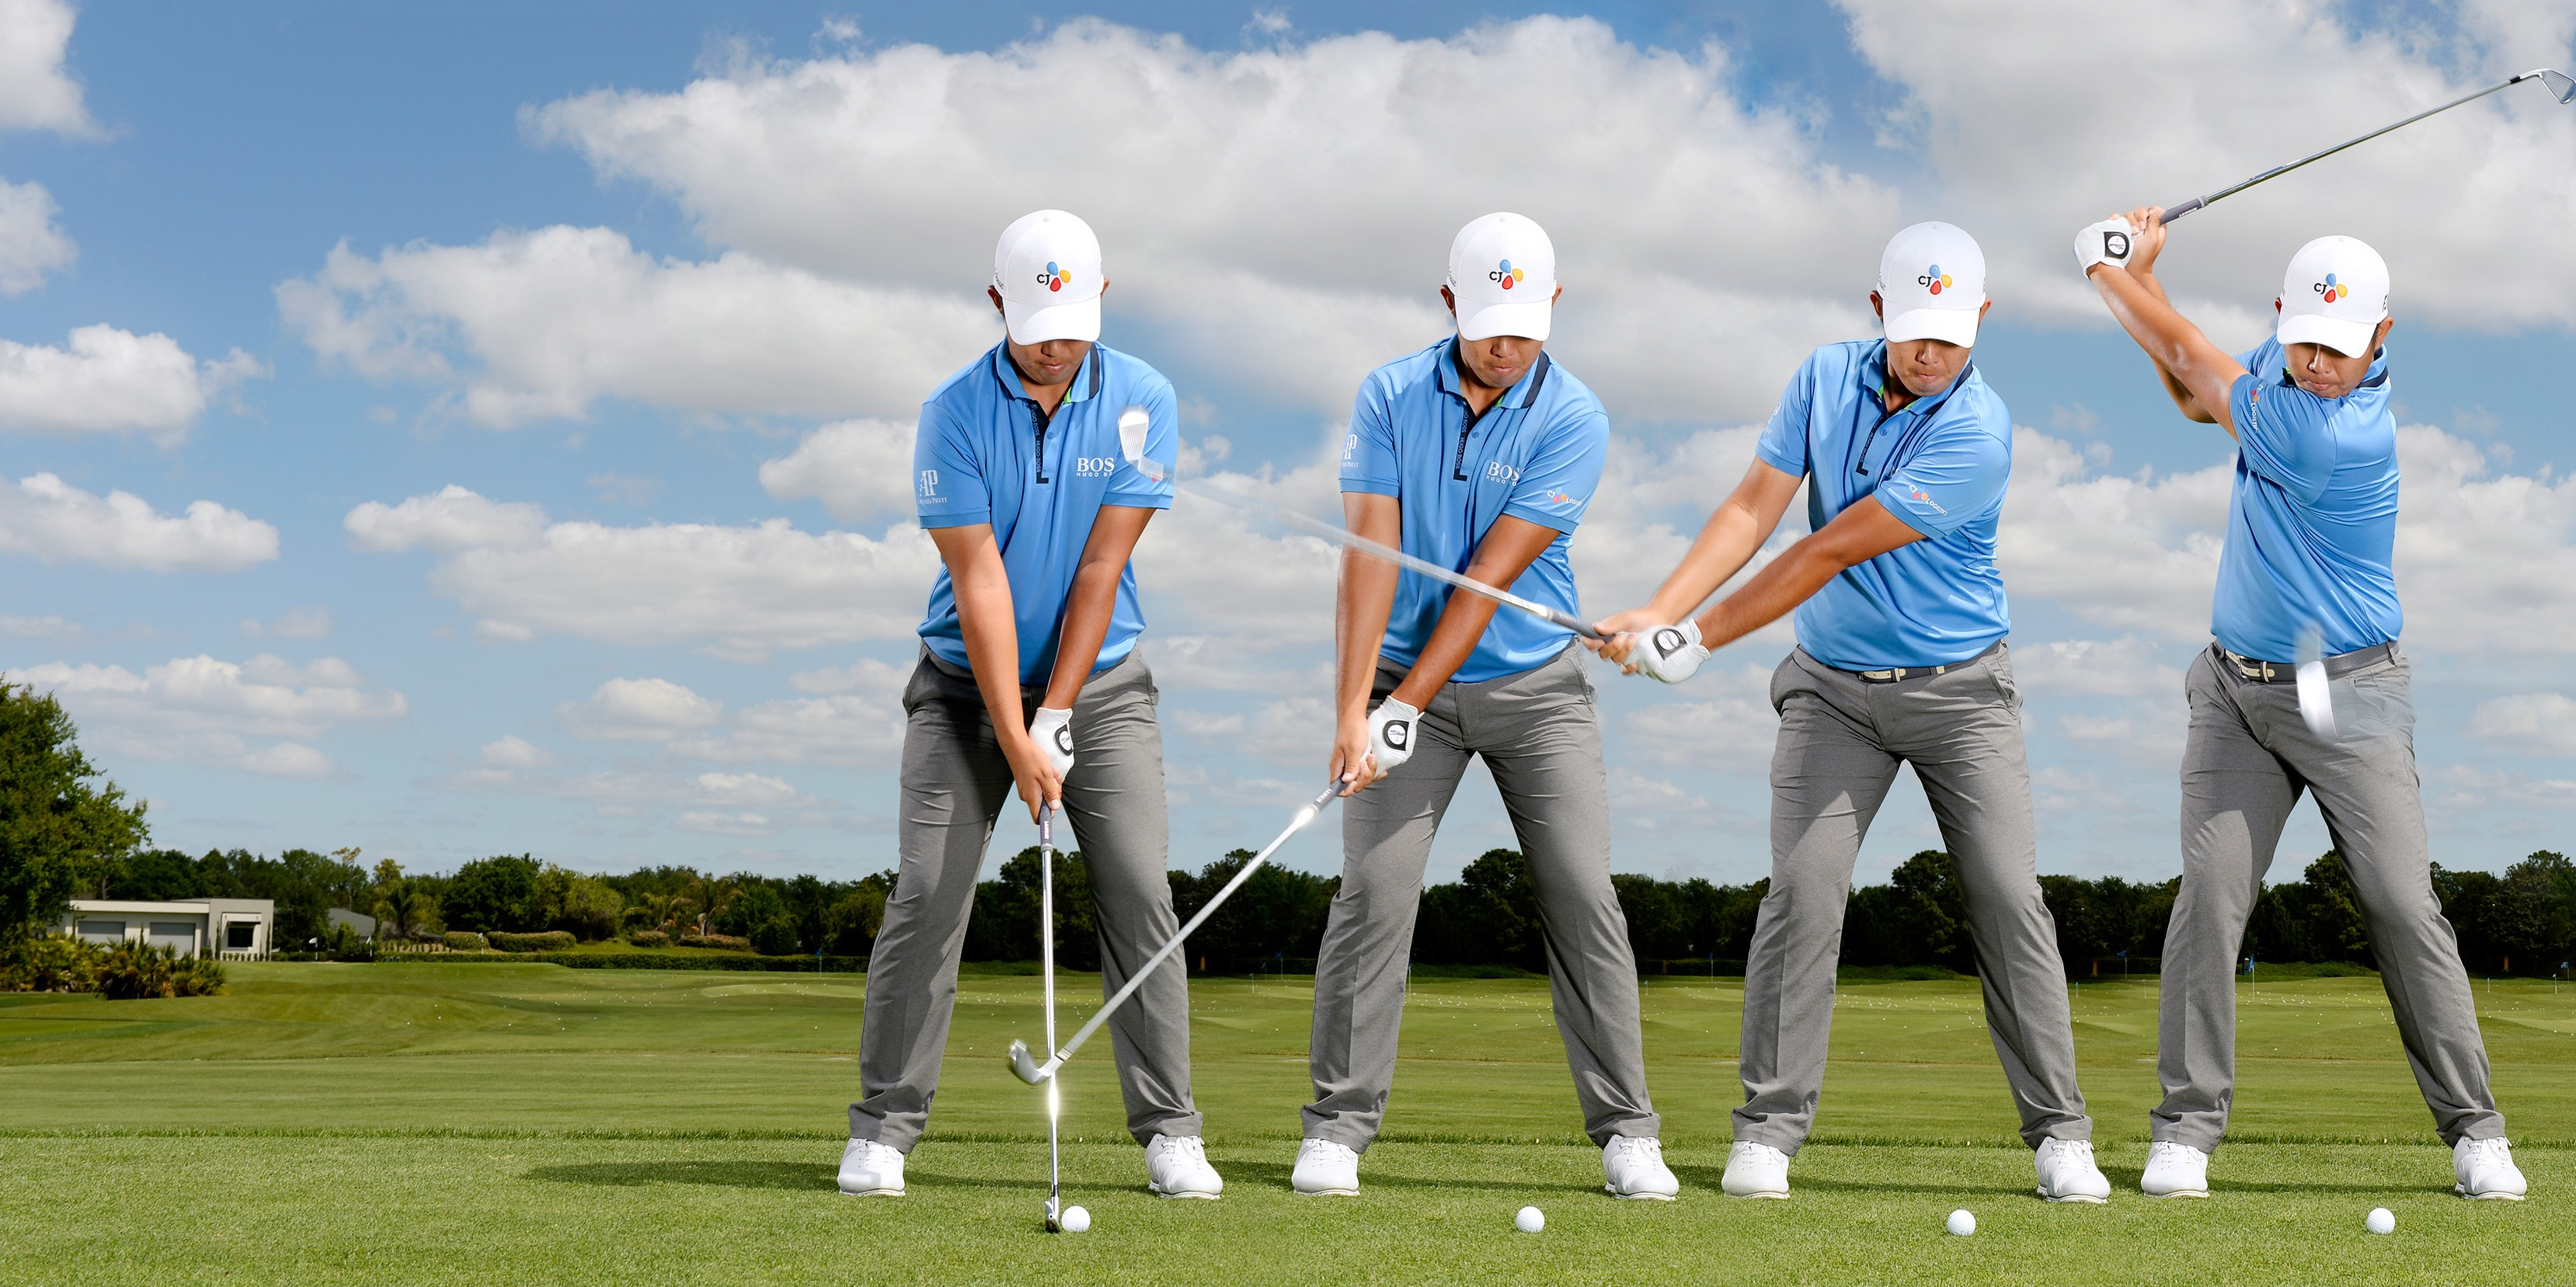 kỹ-thuật-swing-bong-ocean-golf2.jpg